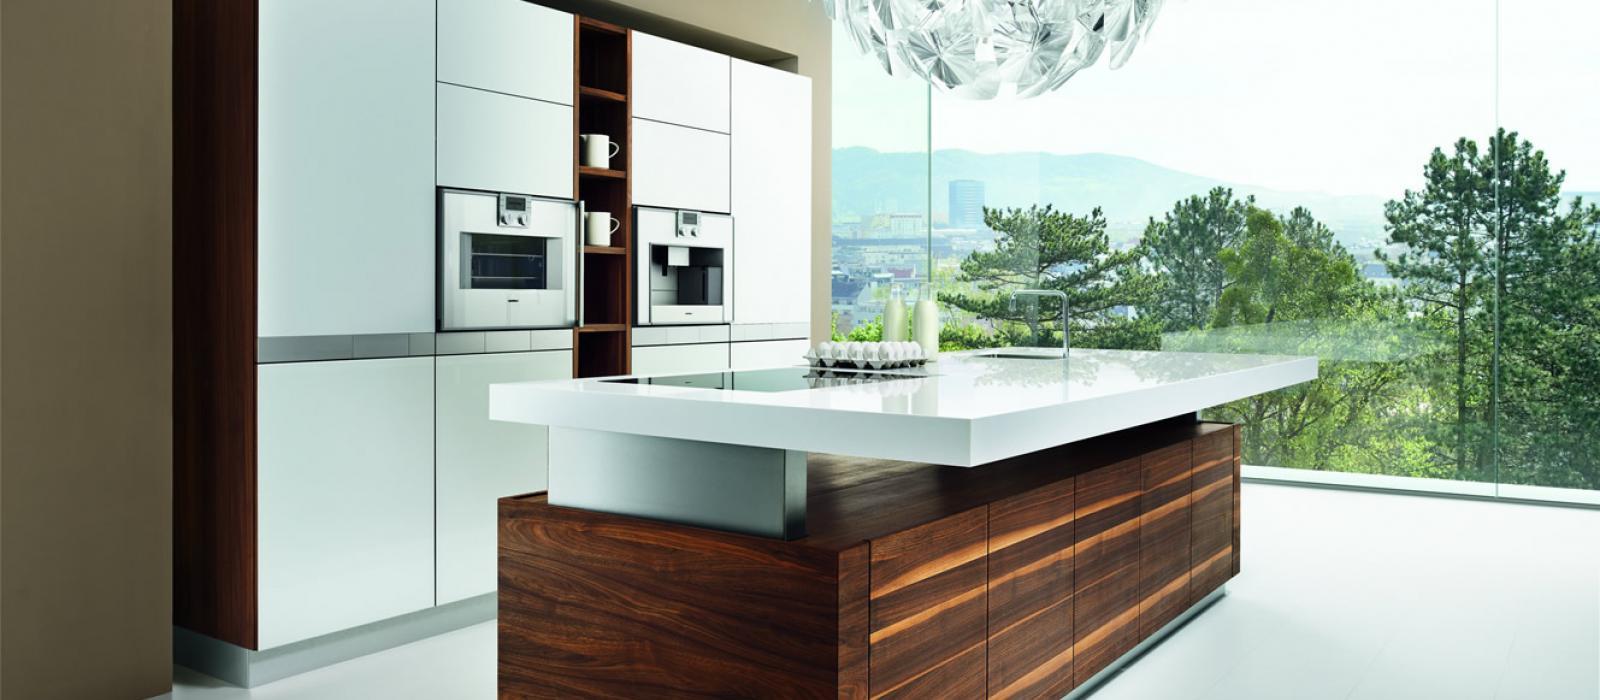 K7 Adjustable Height Kitchen | Team7 Furniture